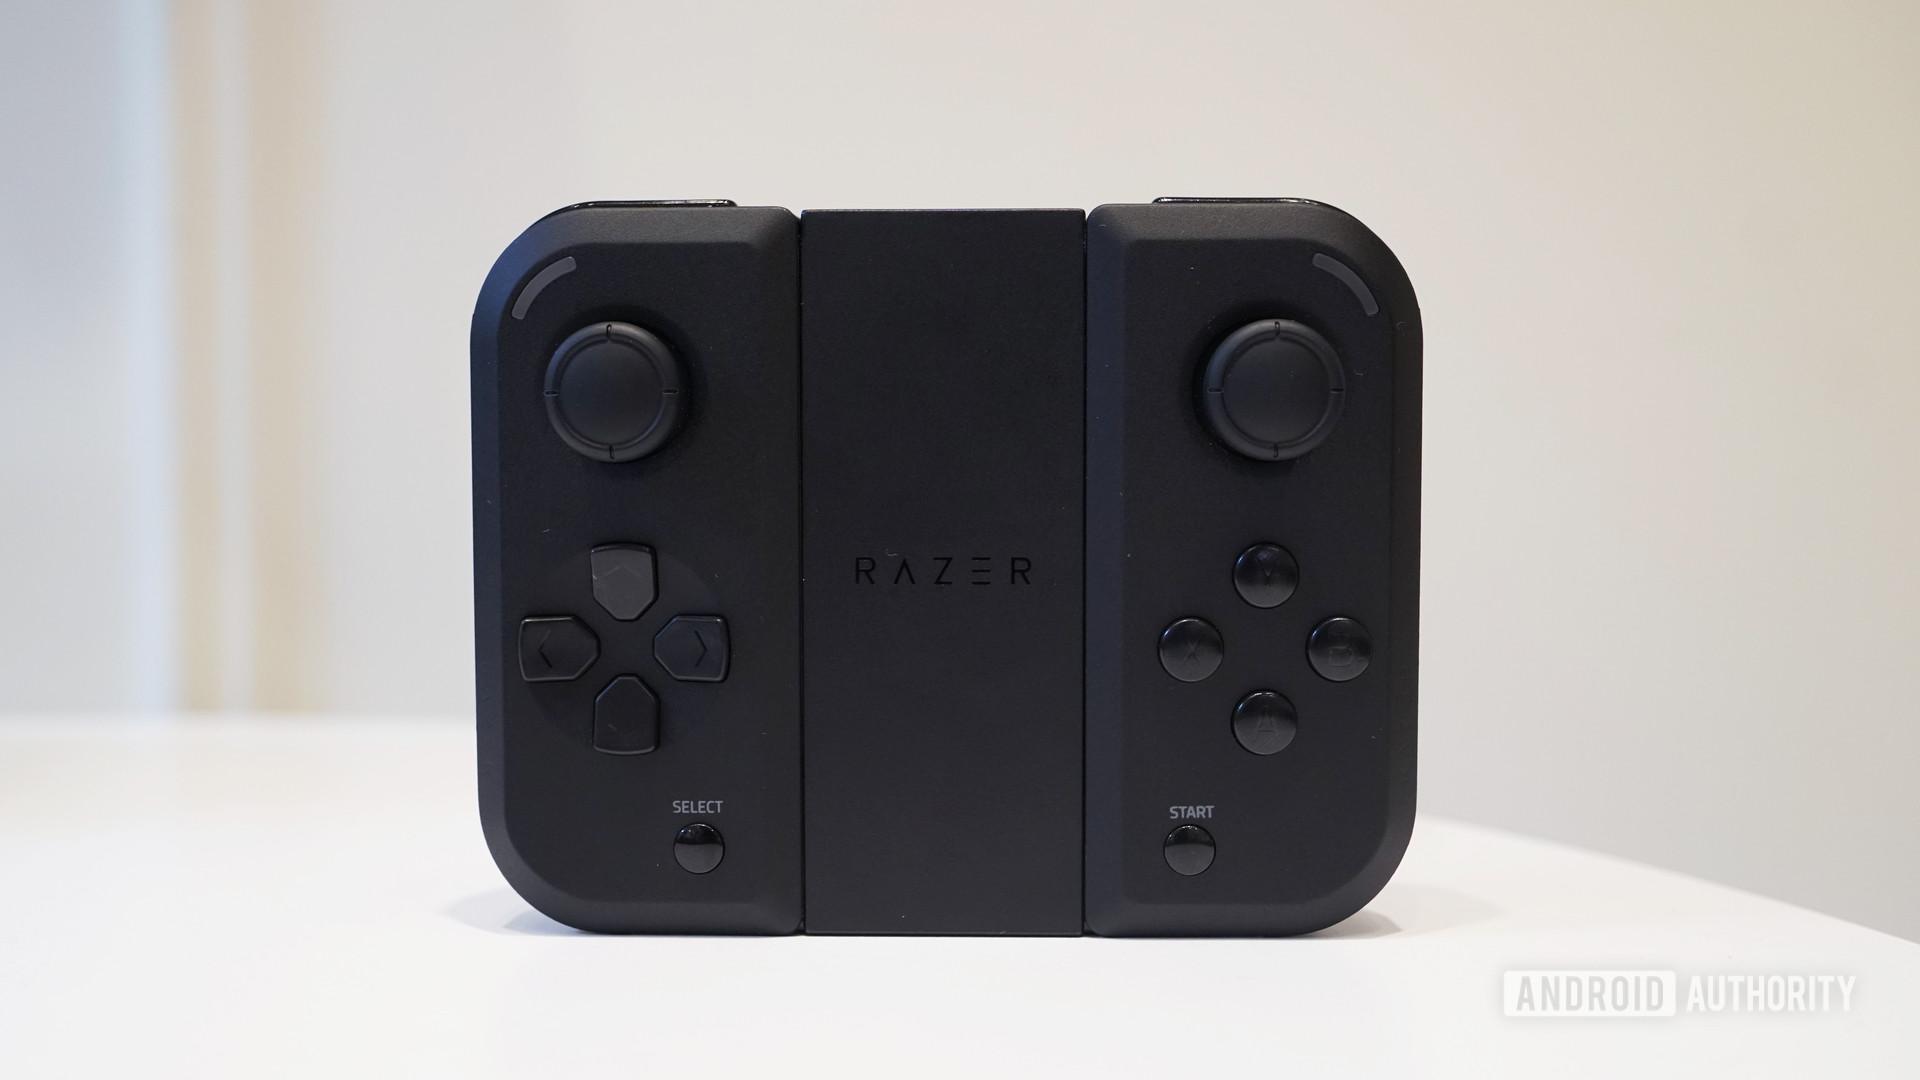 Razer Junglecat controller front view standing